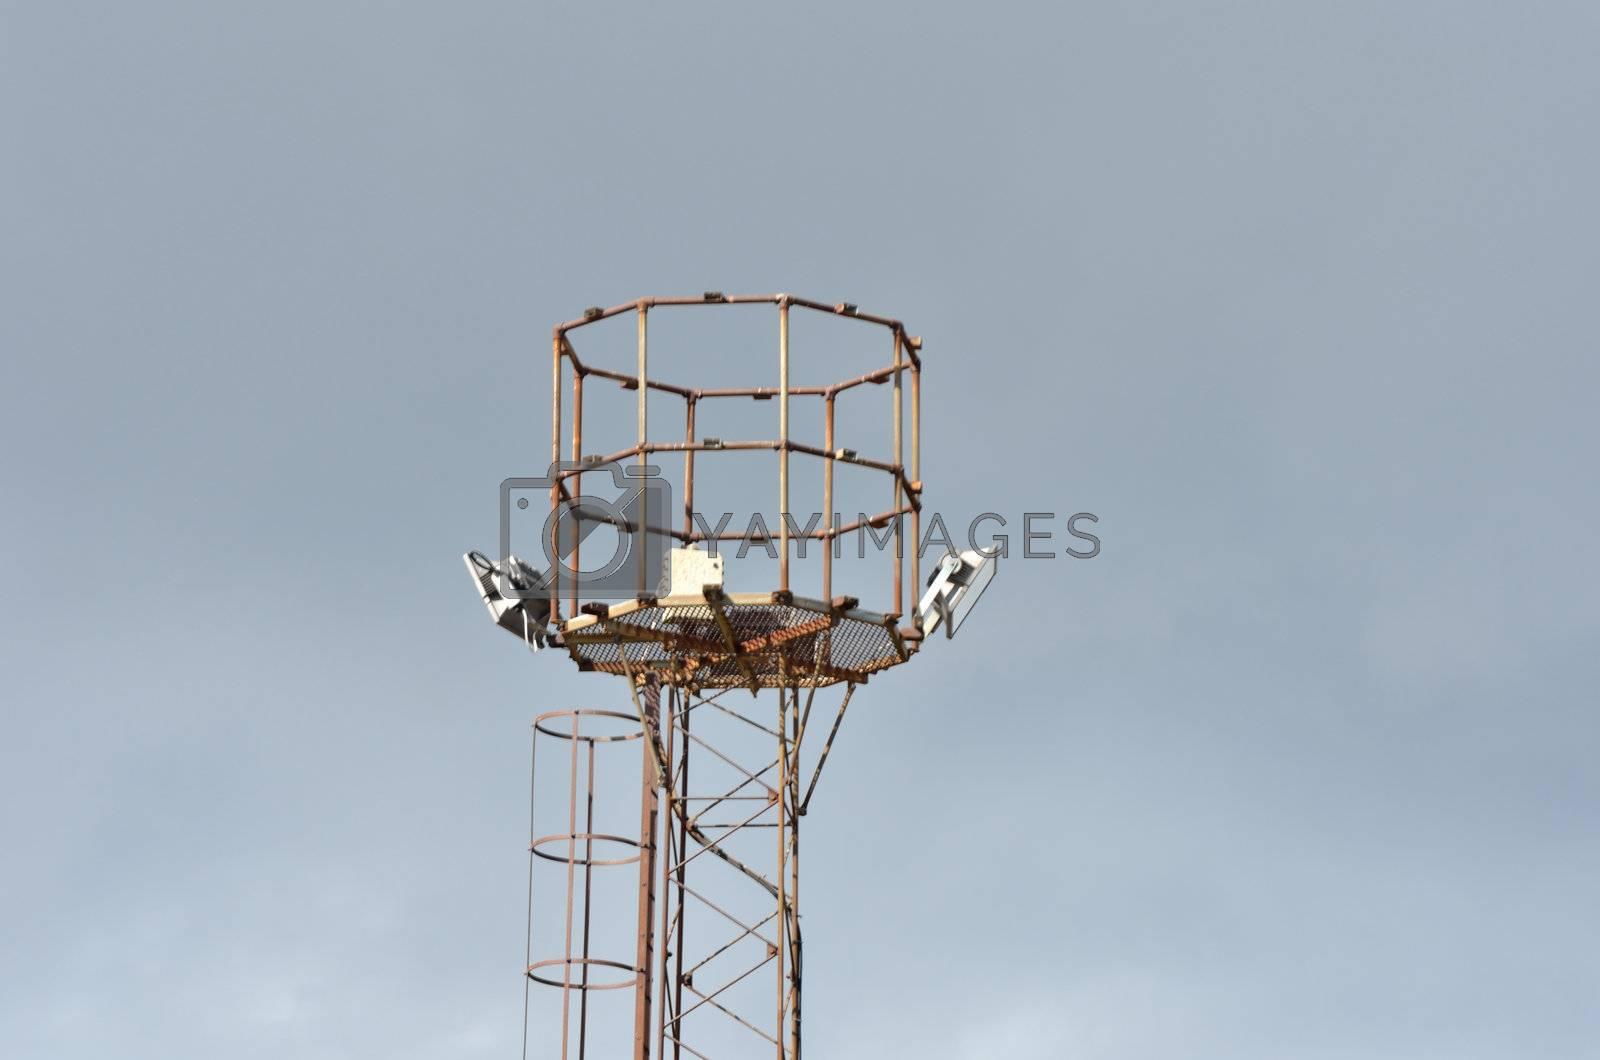 Tall metal tower